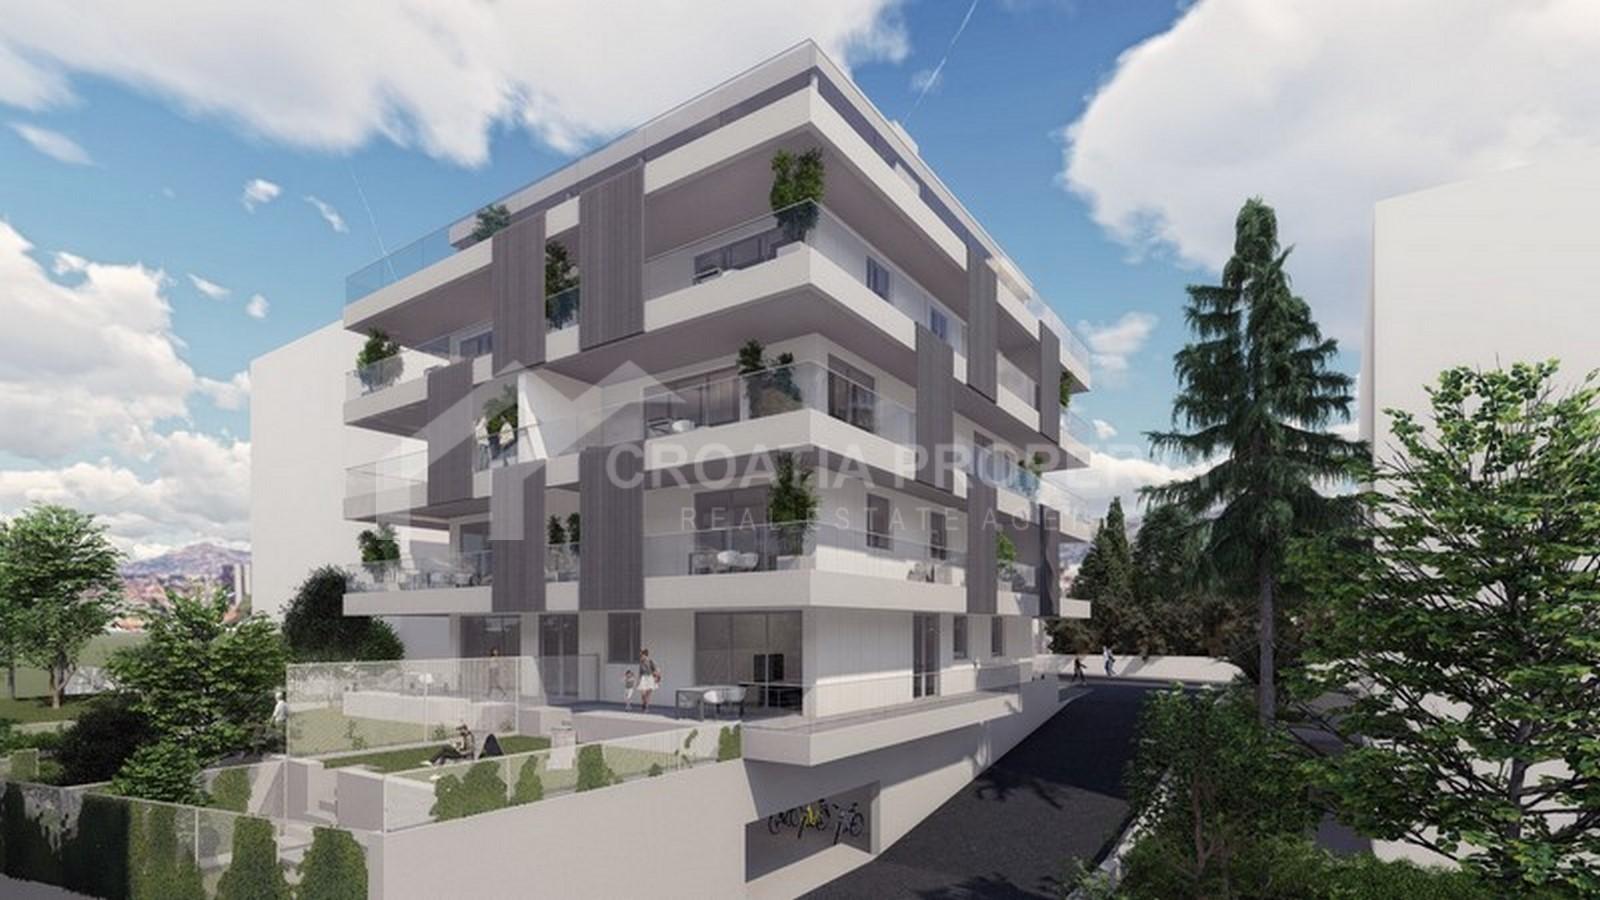 New construction in Hektorovićeva street